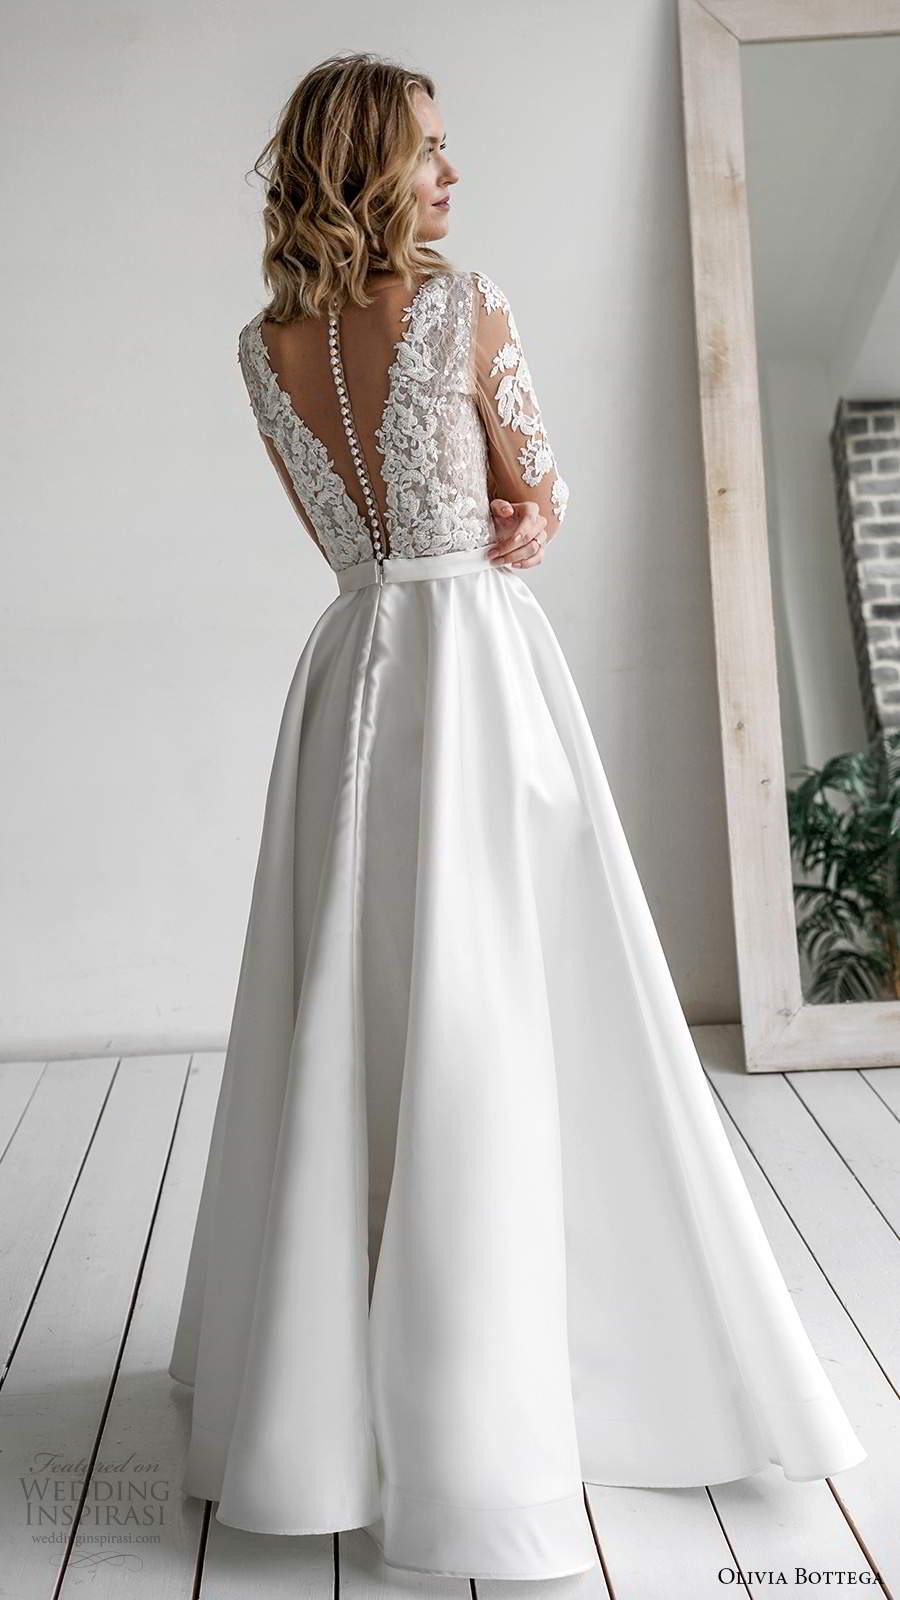 Olivia Bottega 20 Wedding Dresses   Wedding Inspirasi